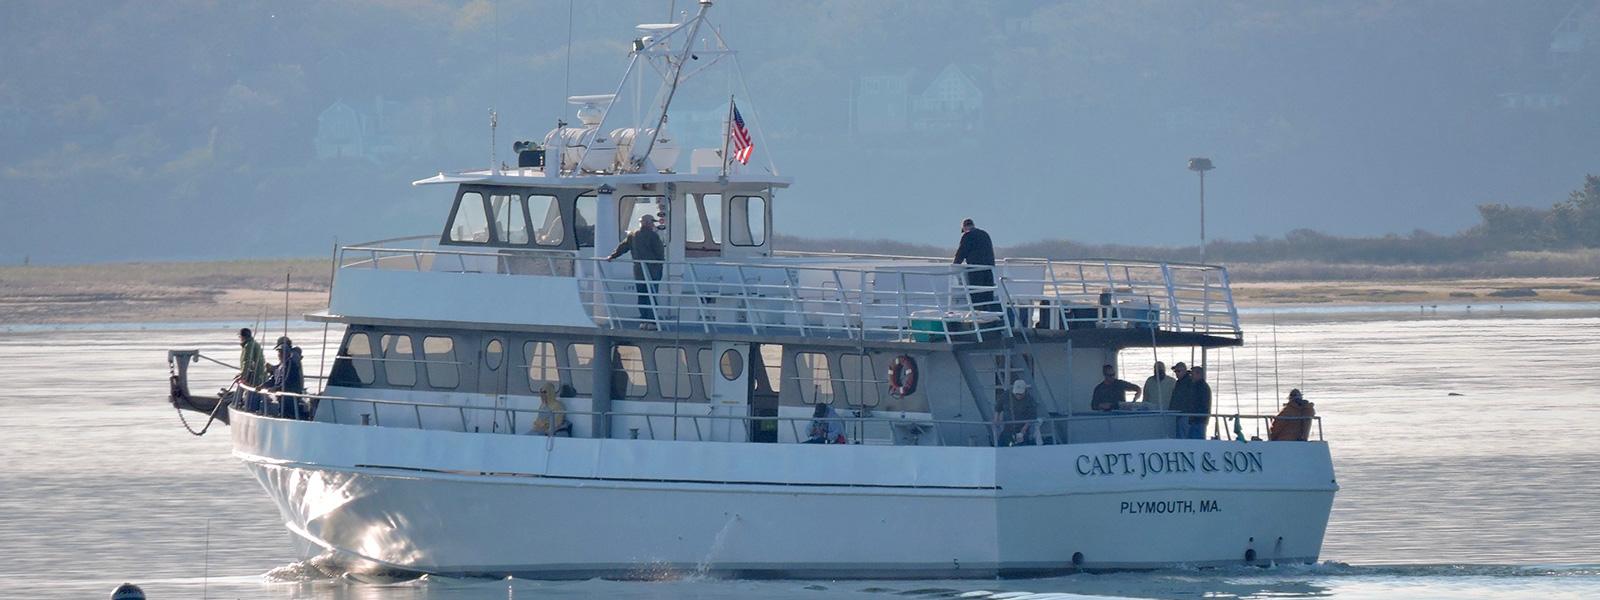 Learn About Captain John Boats in Plymouth, MA   Captain John Boats